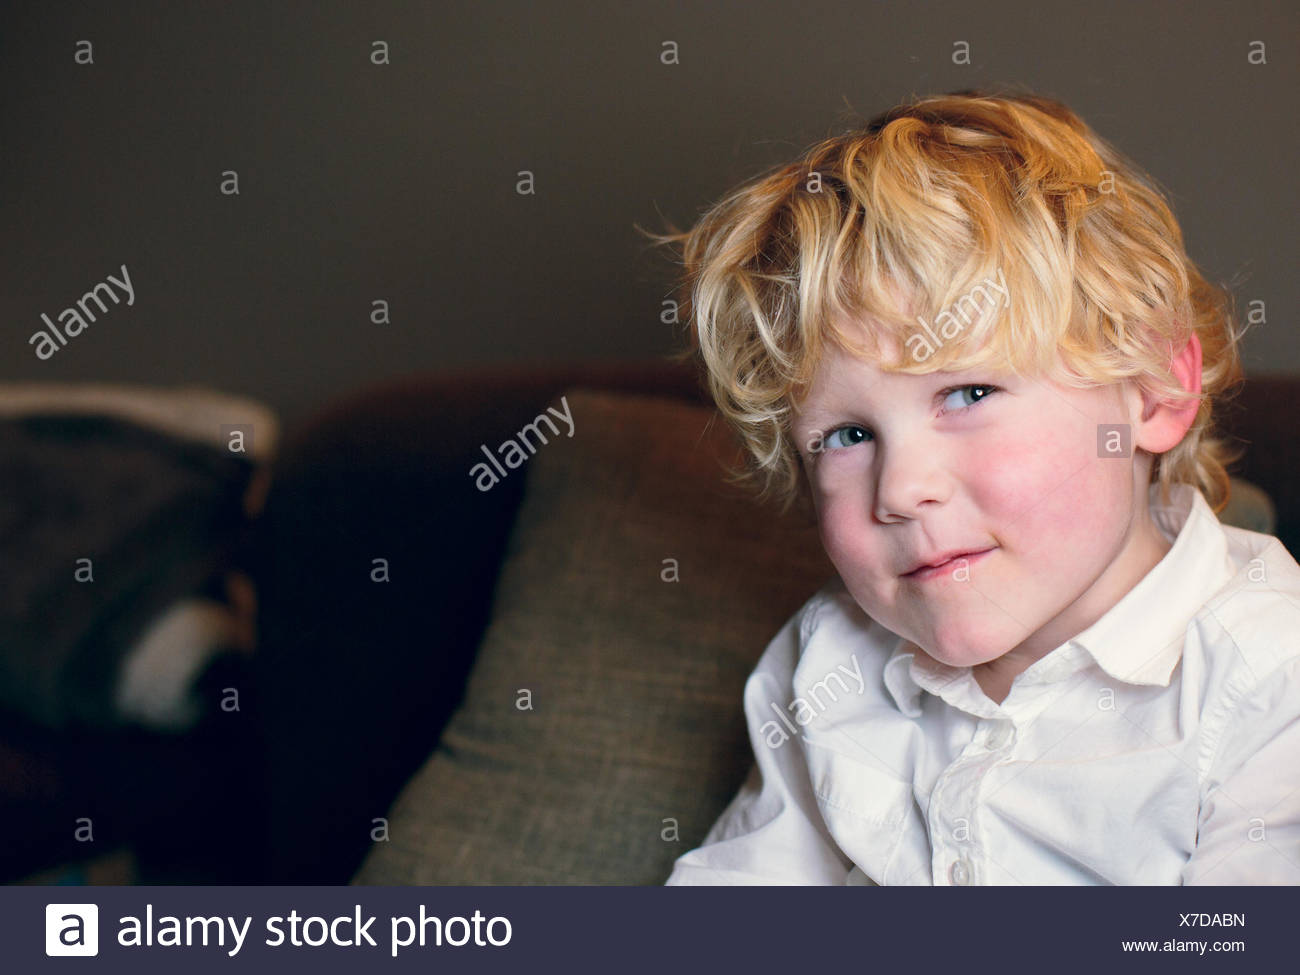 Pays-bas, garçon blond (4-5) en chemise blanche smiling Photo Stock